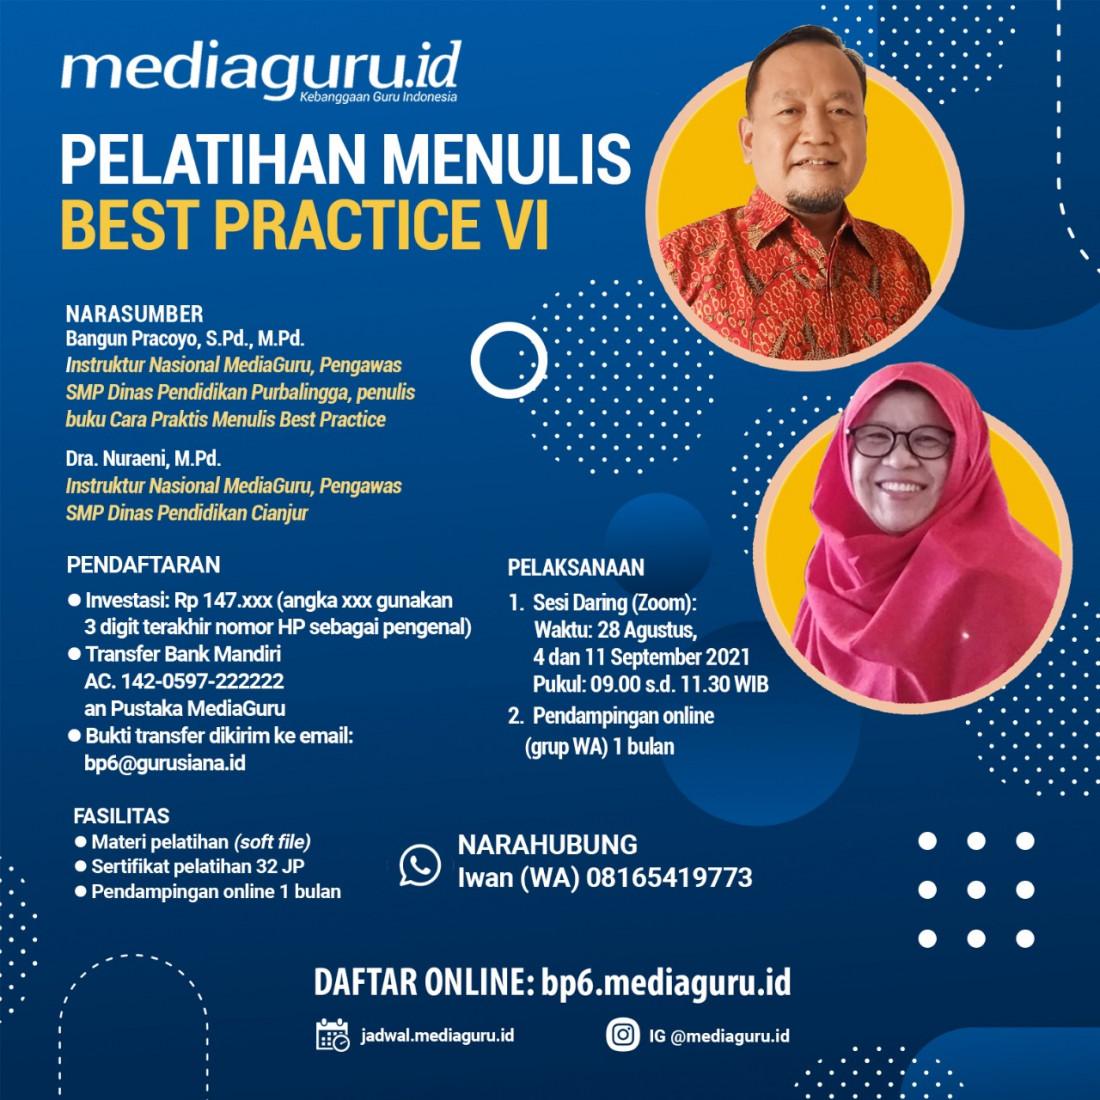 Pelatihan Menulis Best Practive VI MediaGuru (28 Agustus - 11 September 2021)